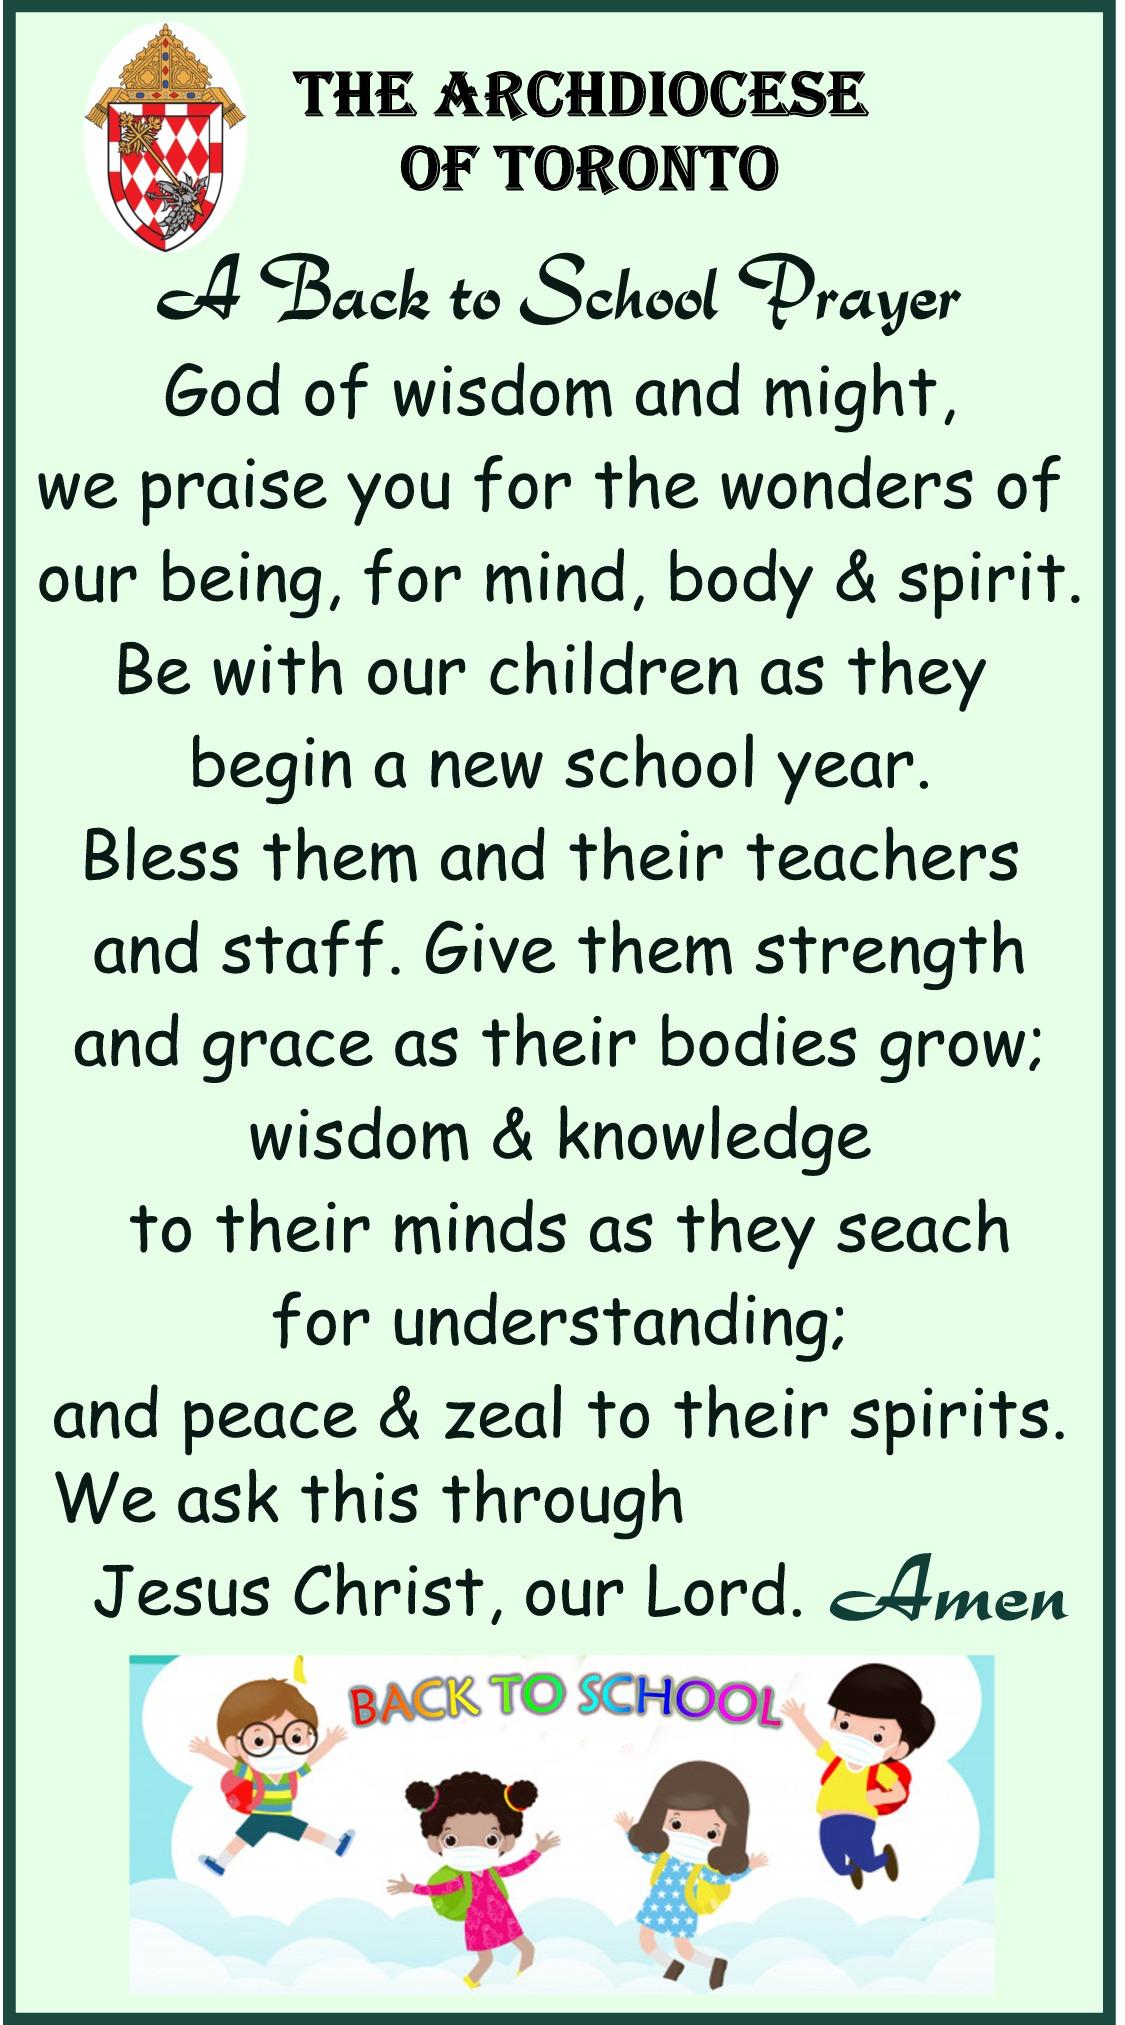 St. Louis Prayer for our children